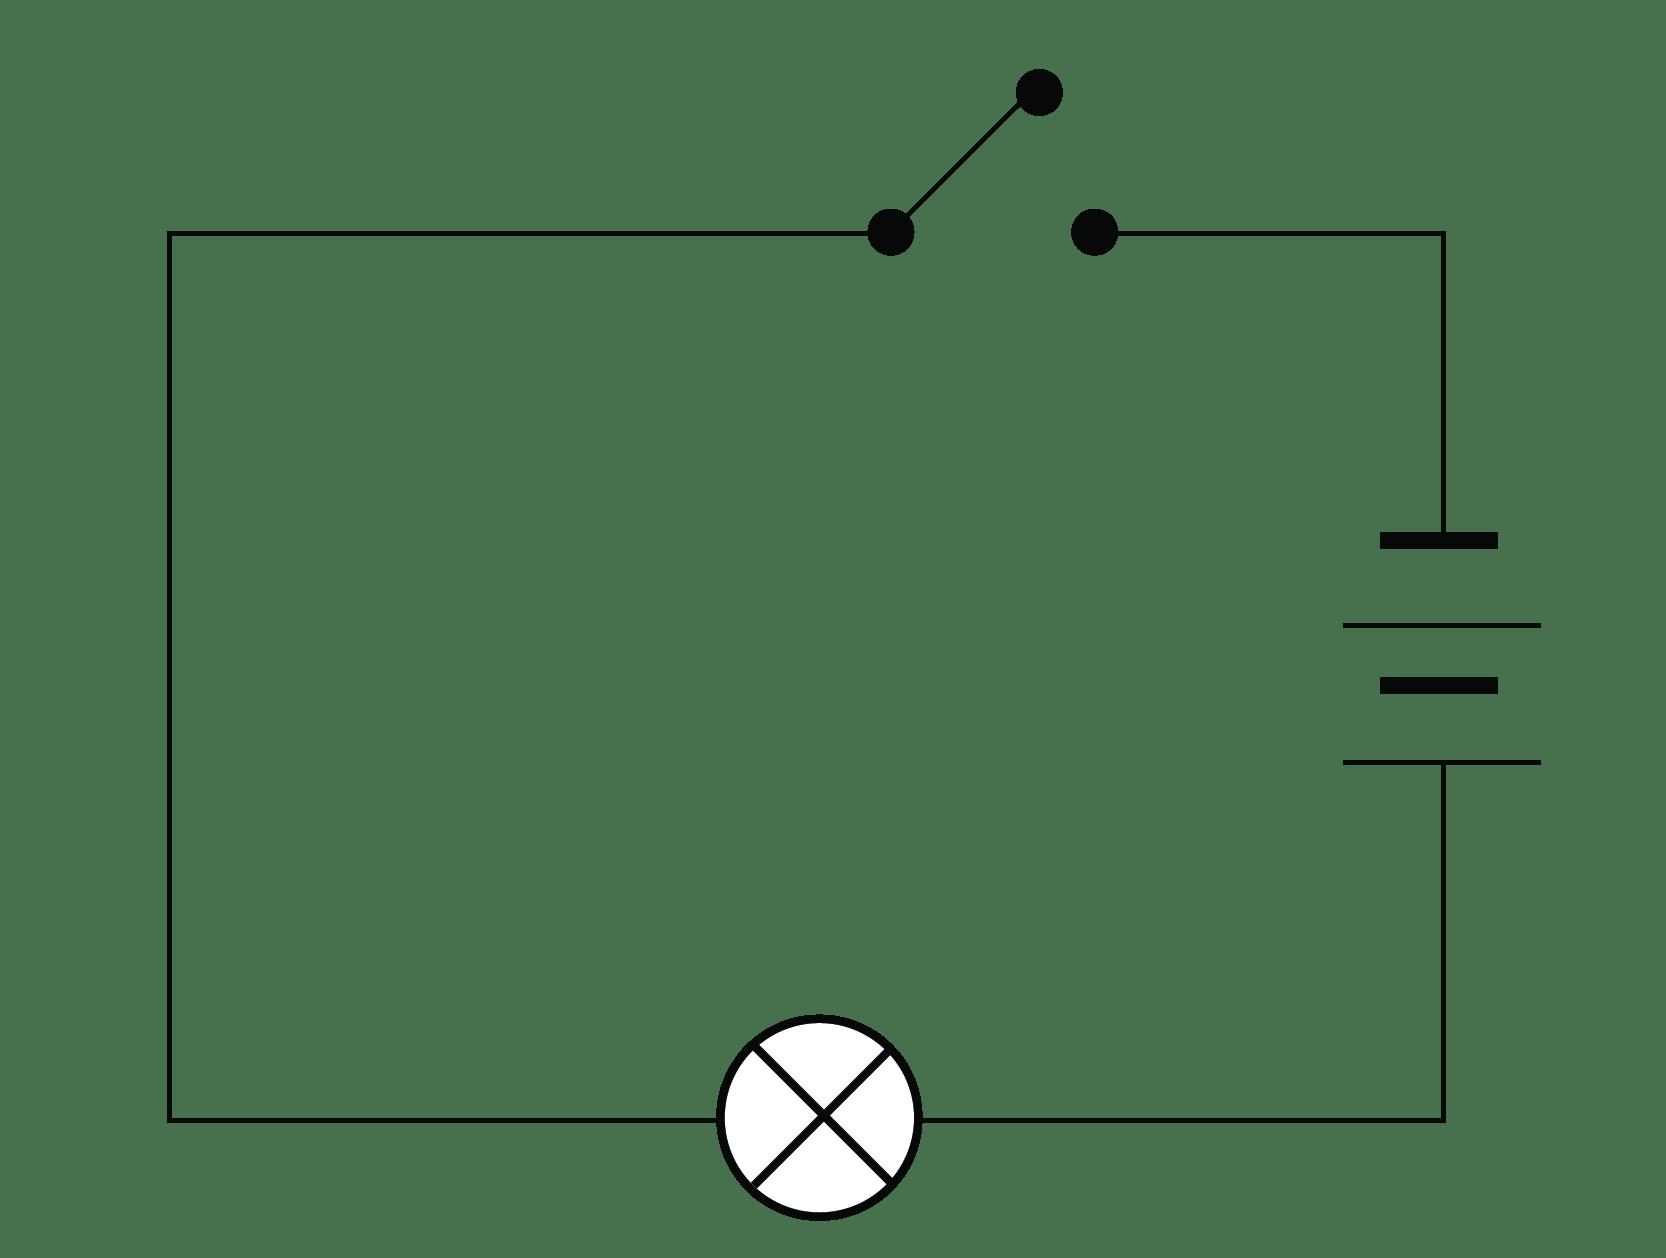 Circuit Diagram Clipart 20 Free Cliparts